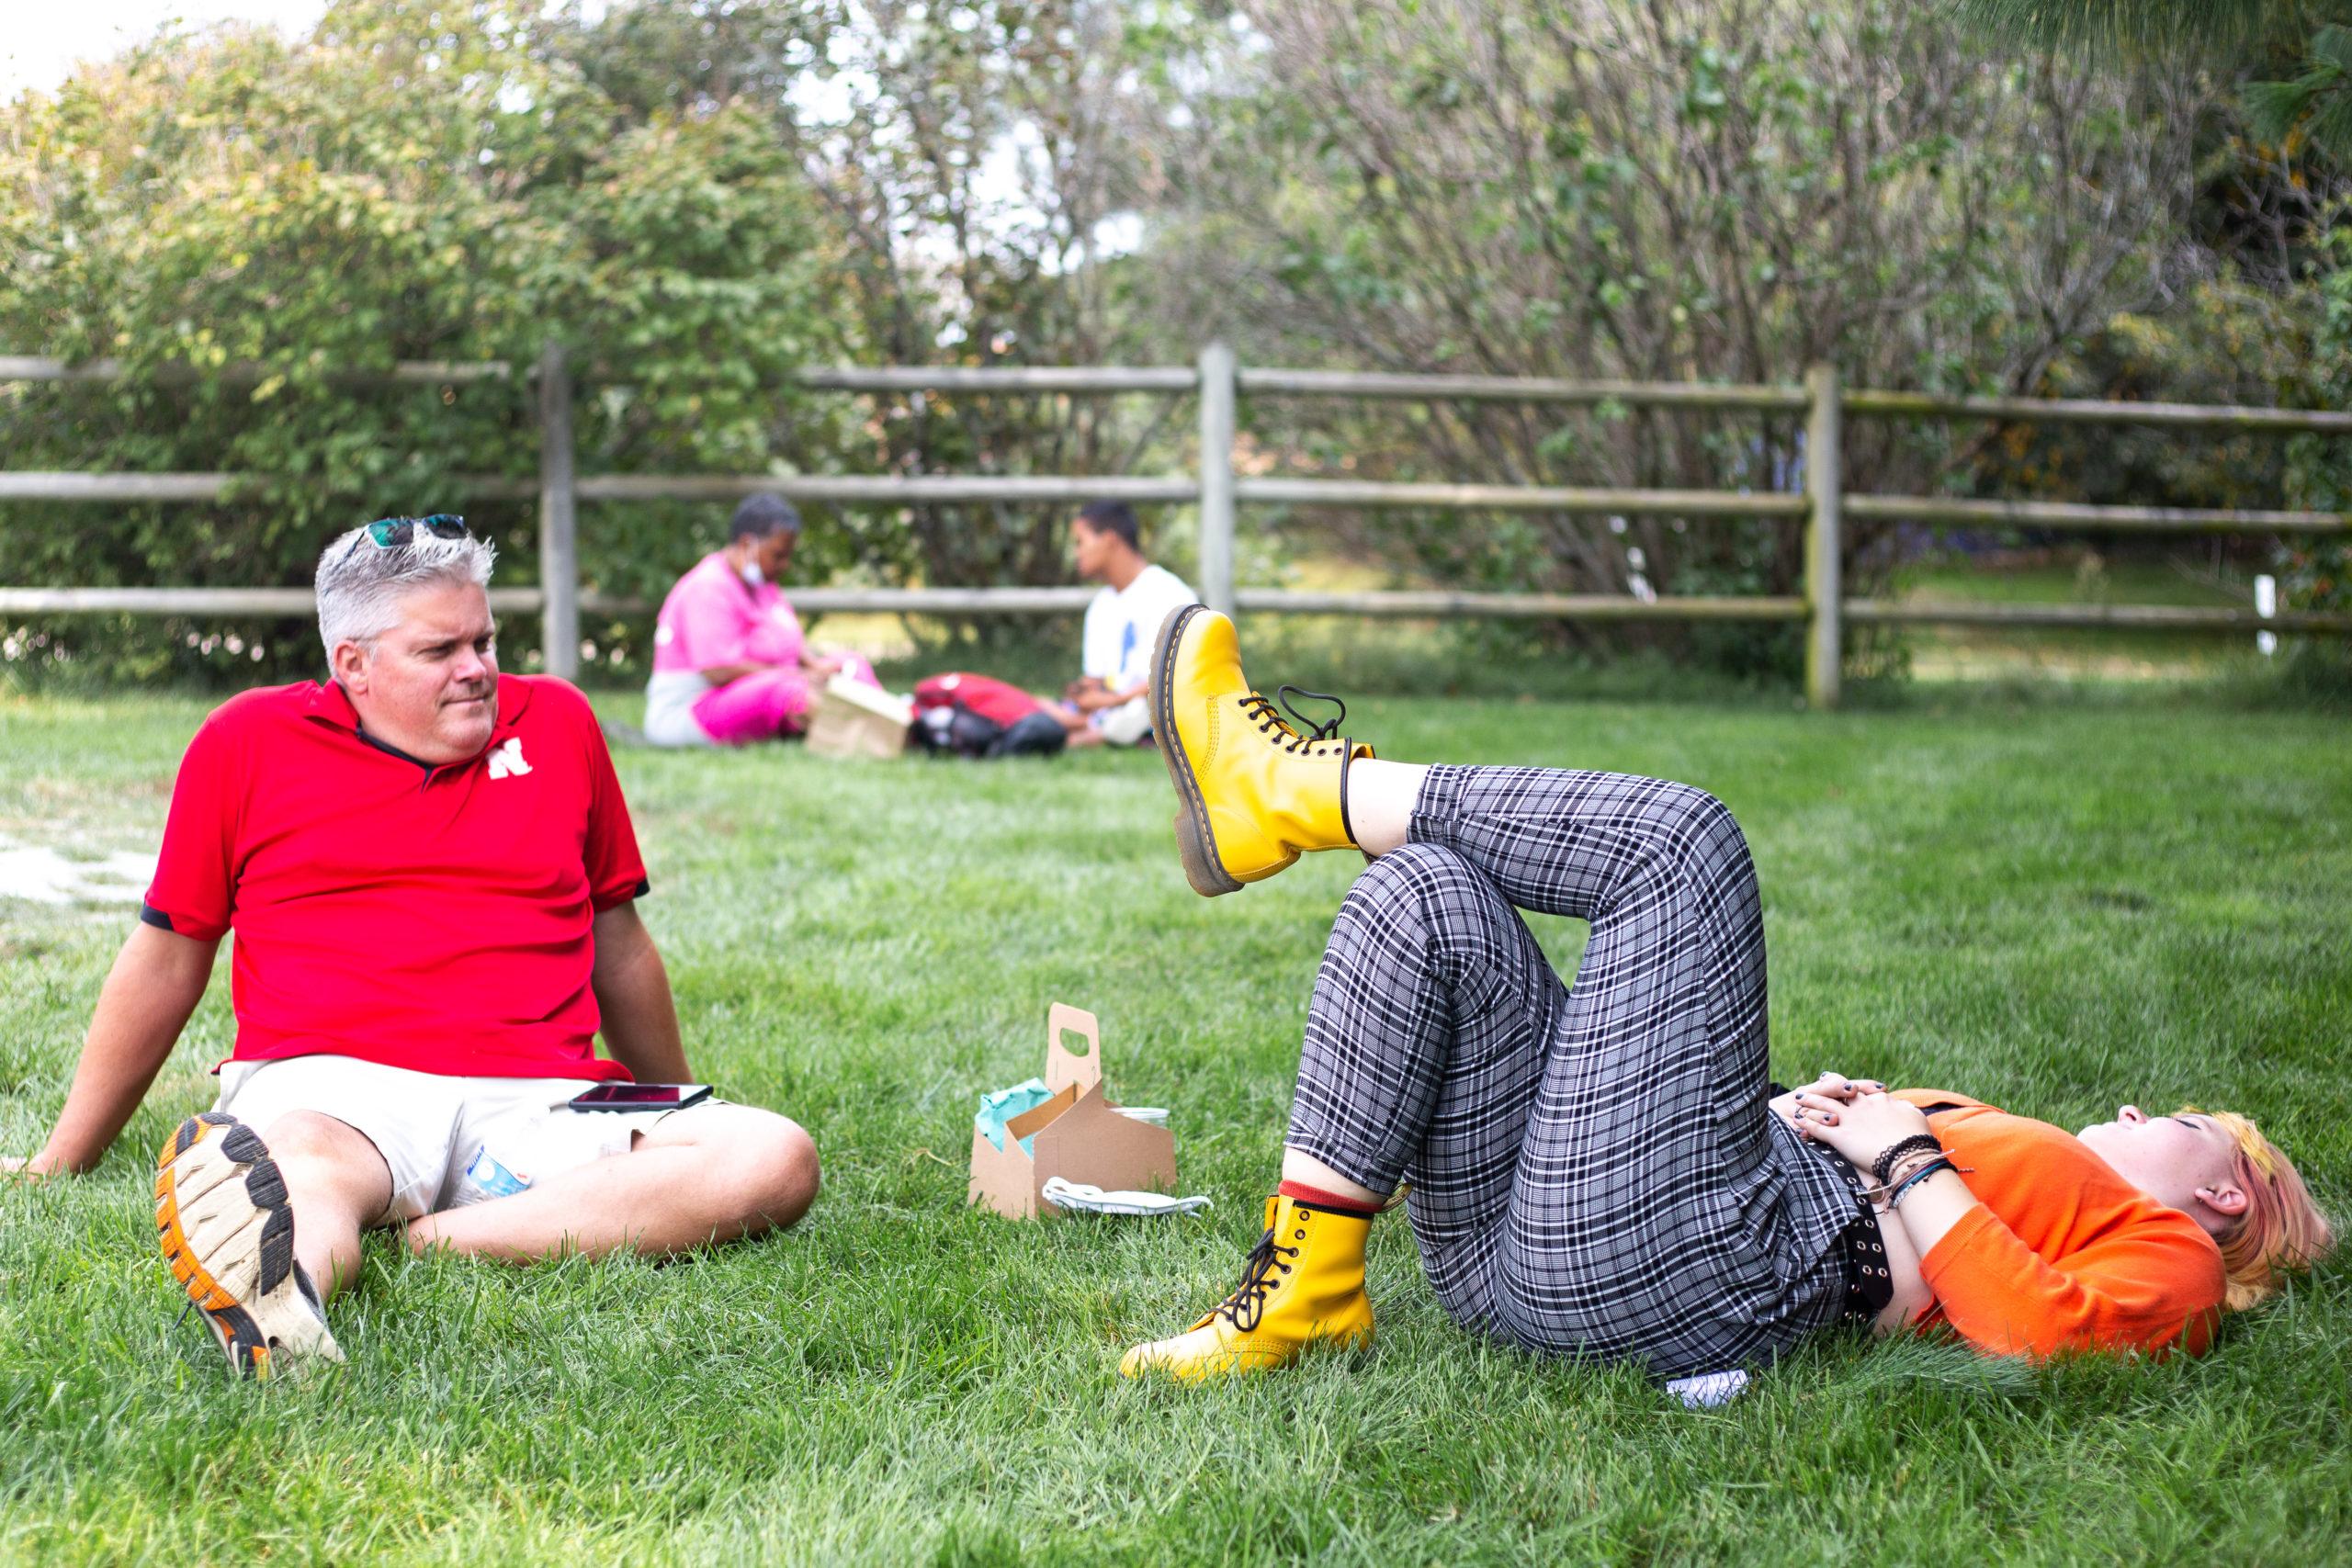 applejack 5 scaled - A weekend at the AppleJack Festival